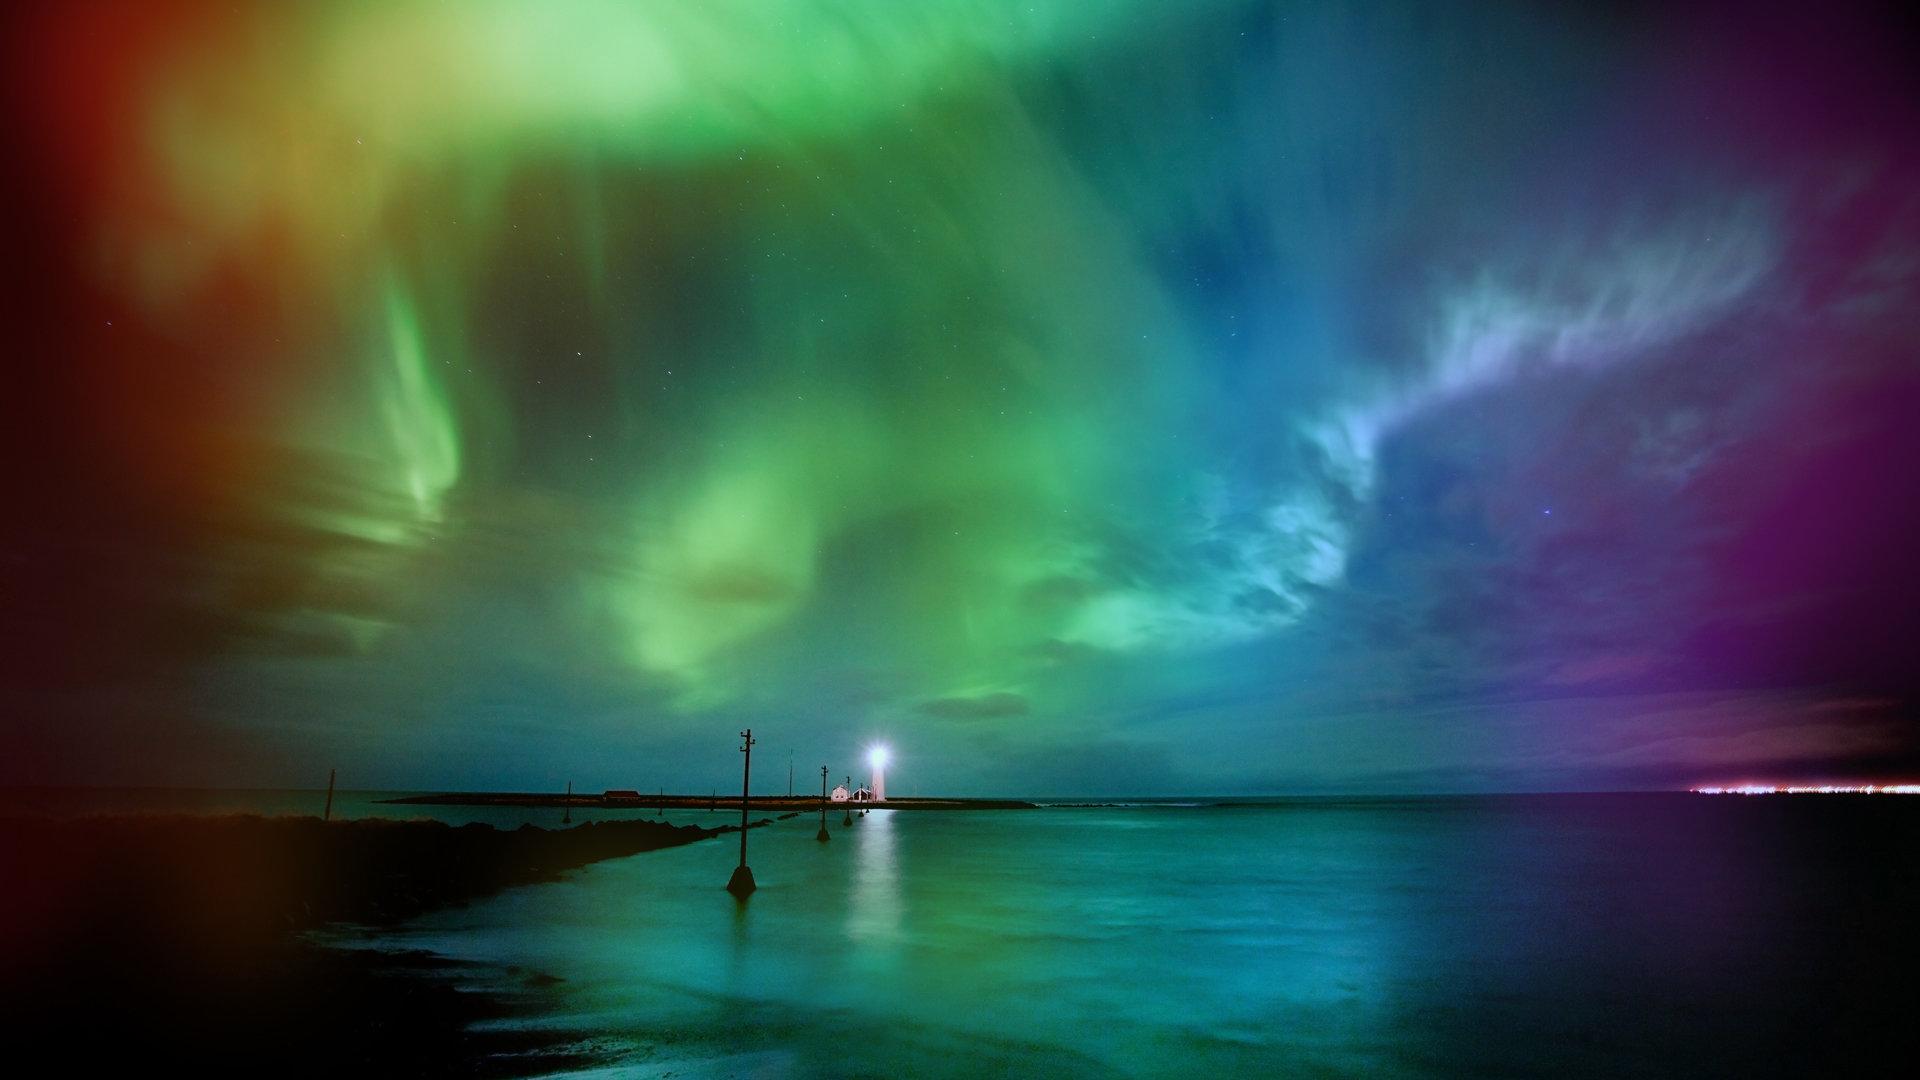 Aurora Borealis wallpapers 1920x1080 Full HD (1080p ...